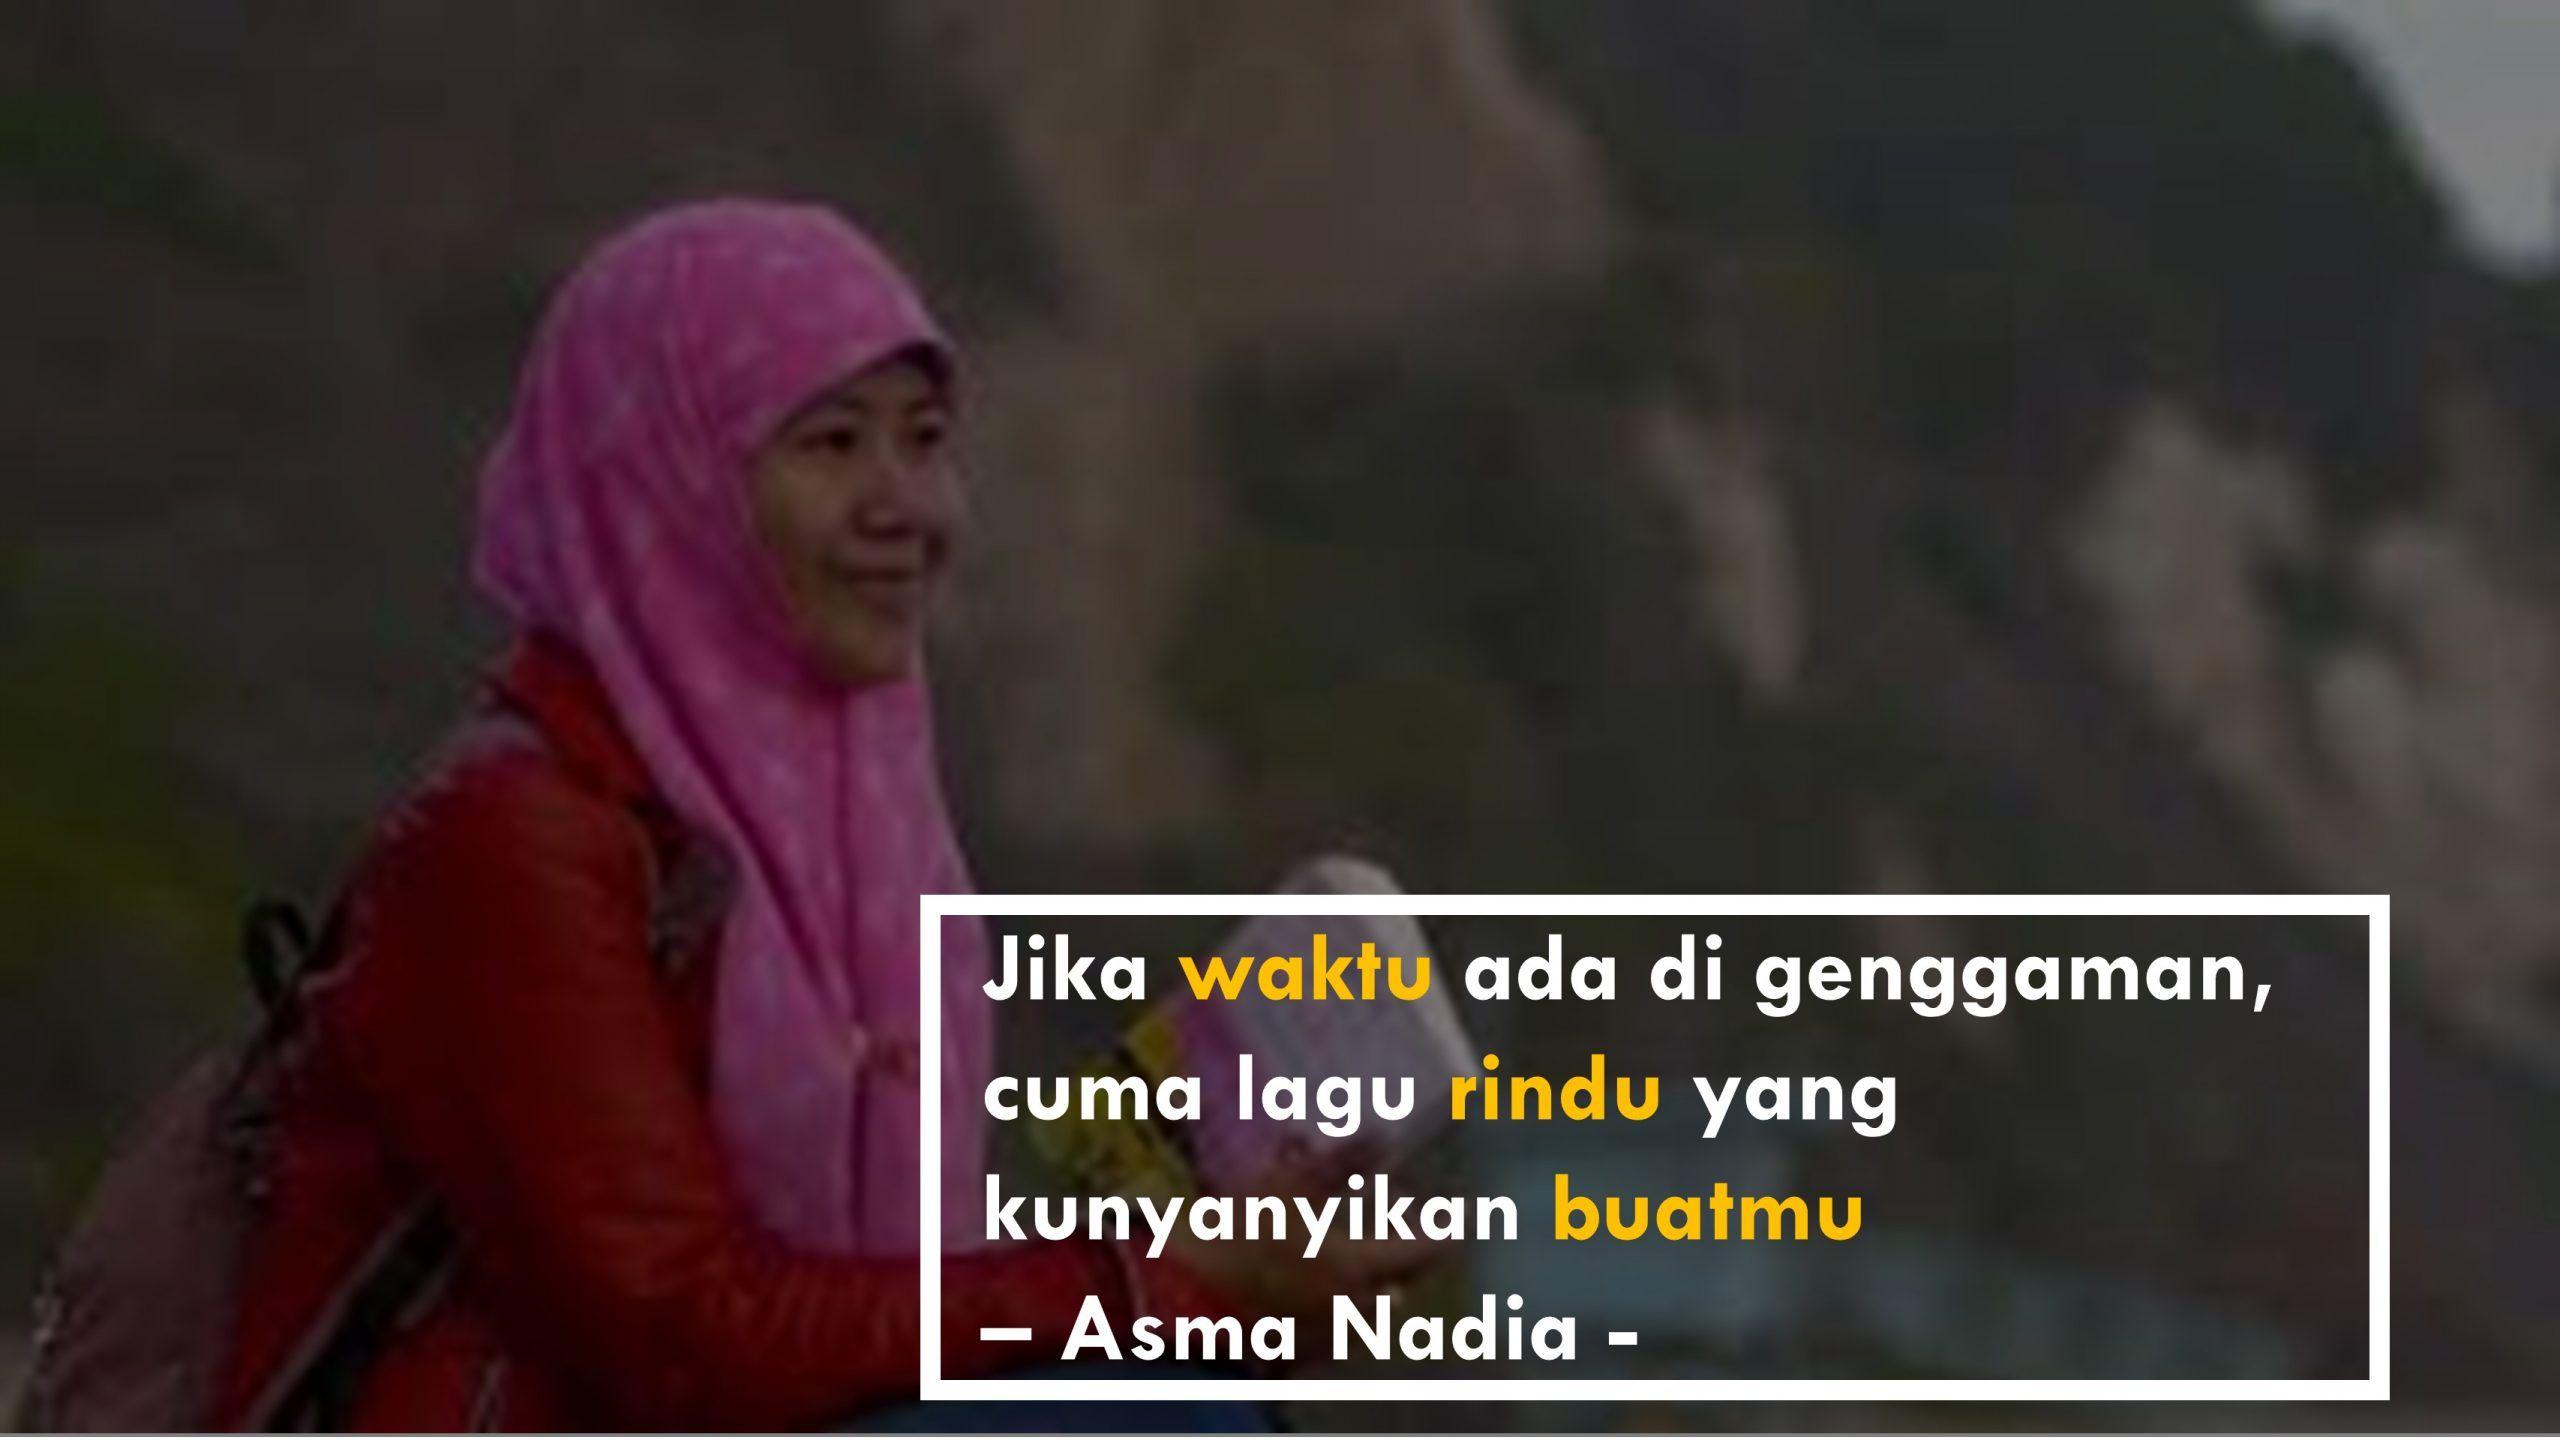 Kumpulan Kata Bijak Asma Nadia Tentang Cinta Rindu